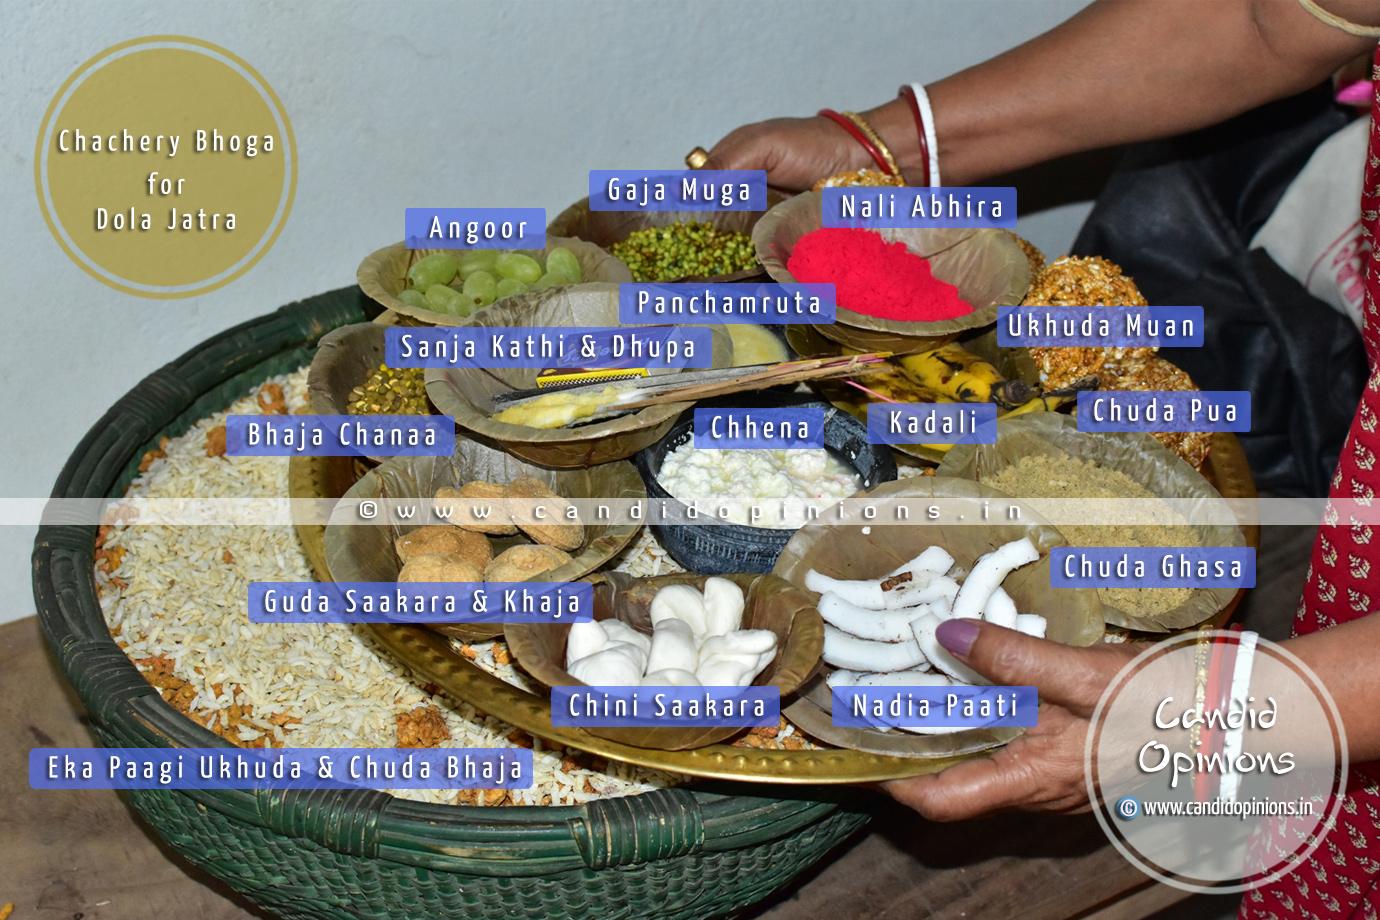 Chachery Bhoga During Dola Jatra